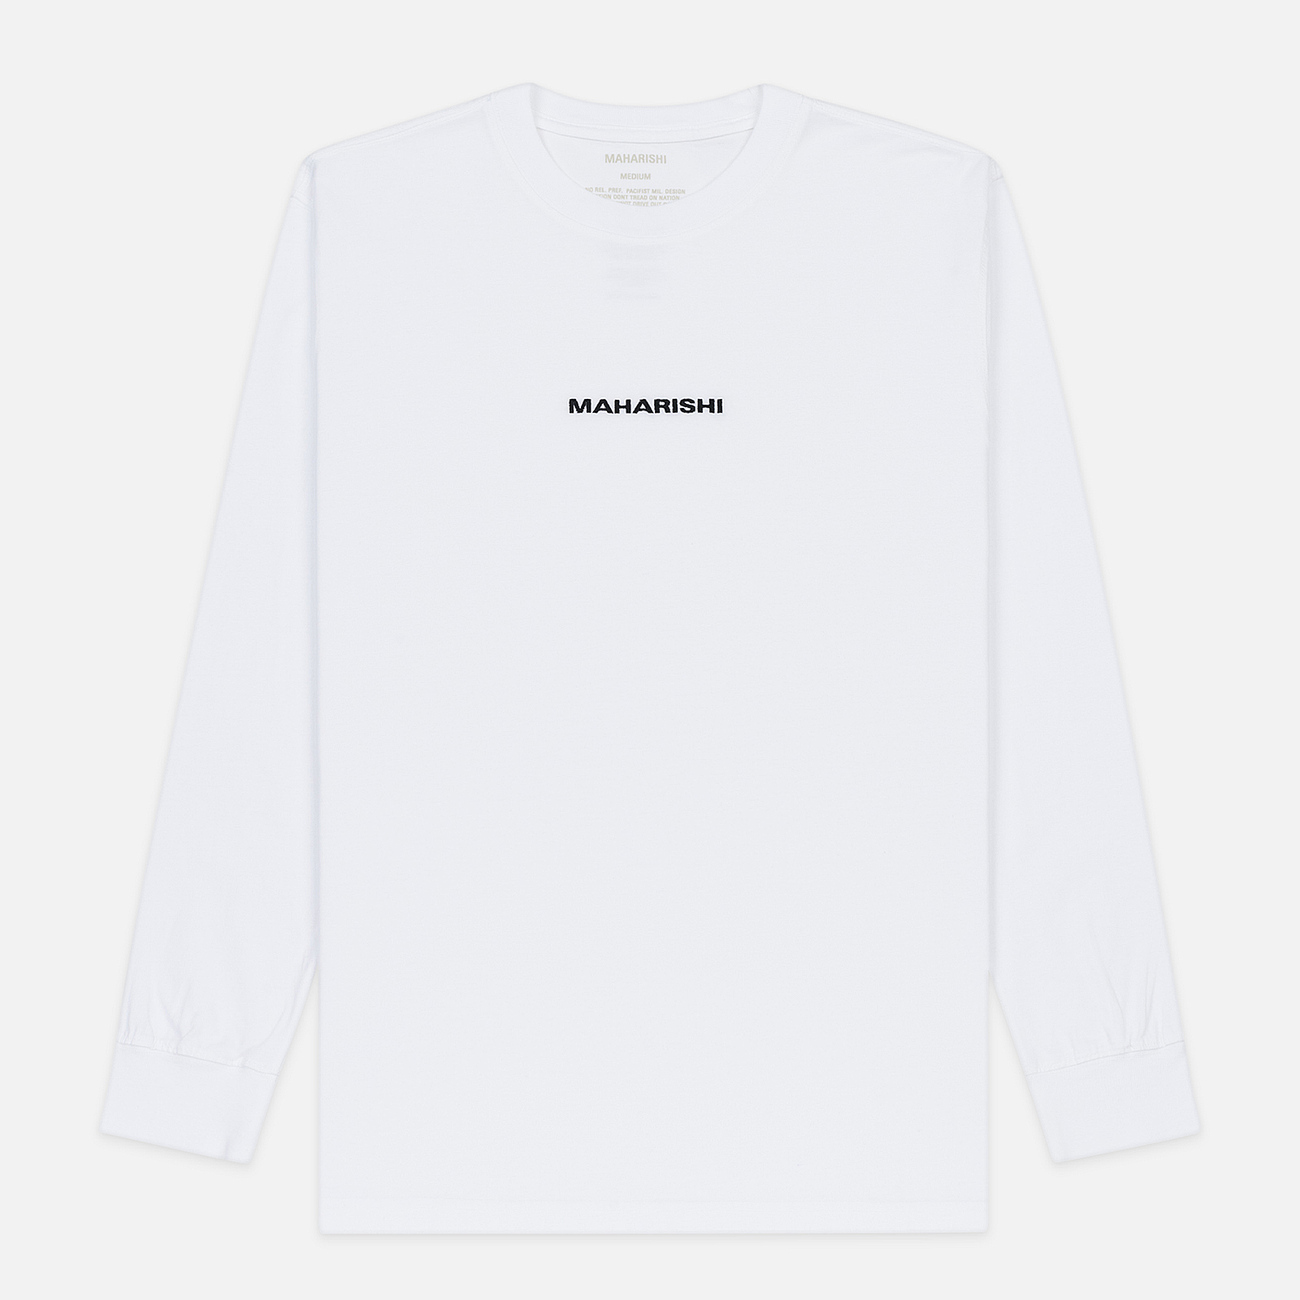 Мужской лонгслив maharishi Organic Military Type Embroidery White